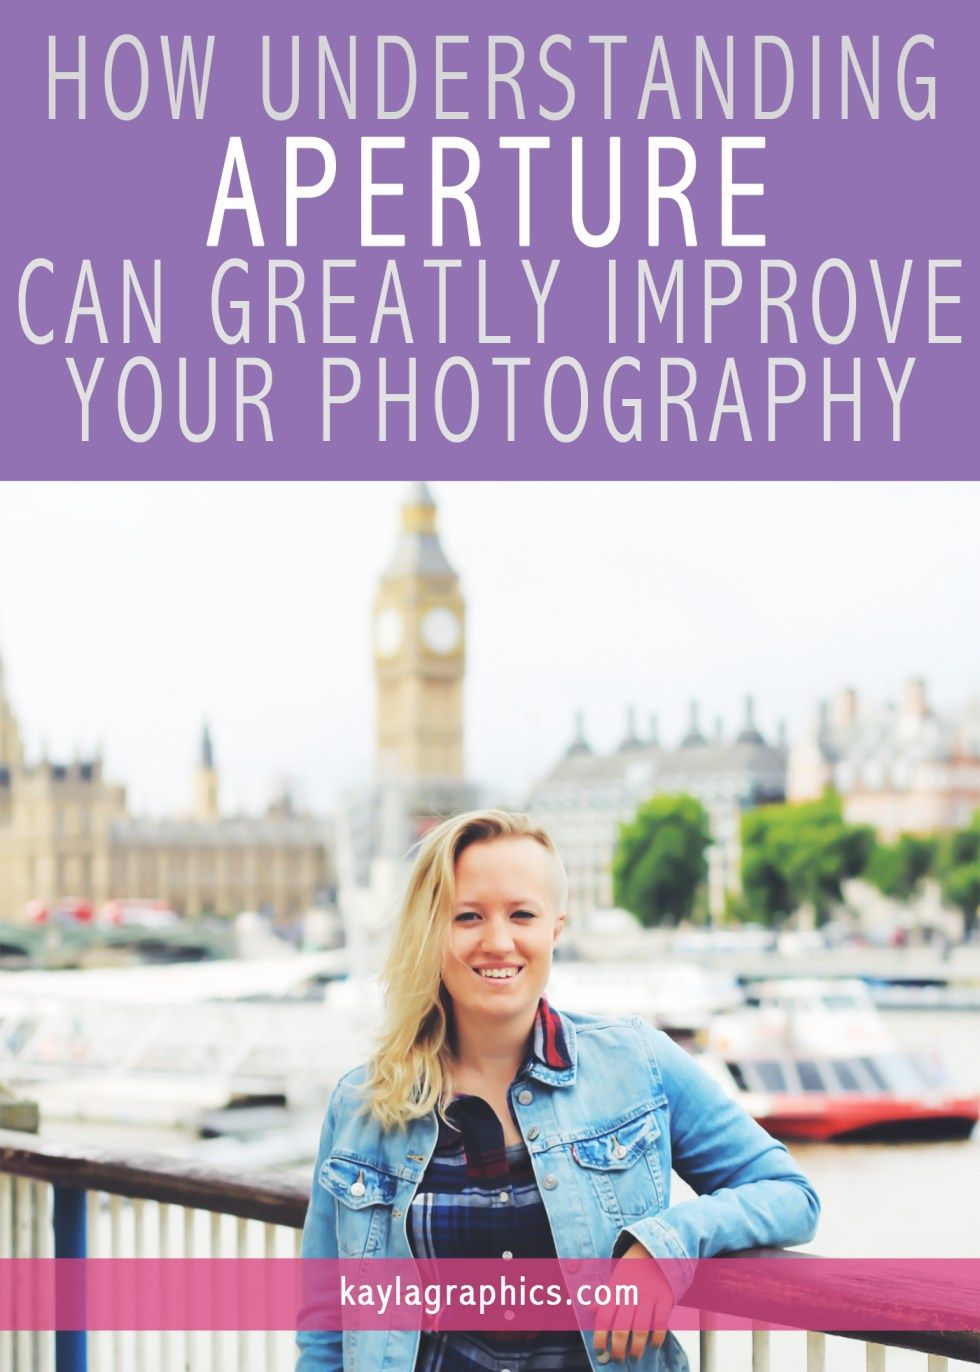 Understanding Aperture | Photography Business | Improve